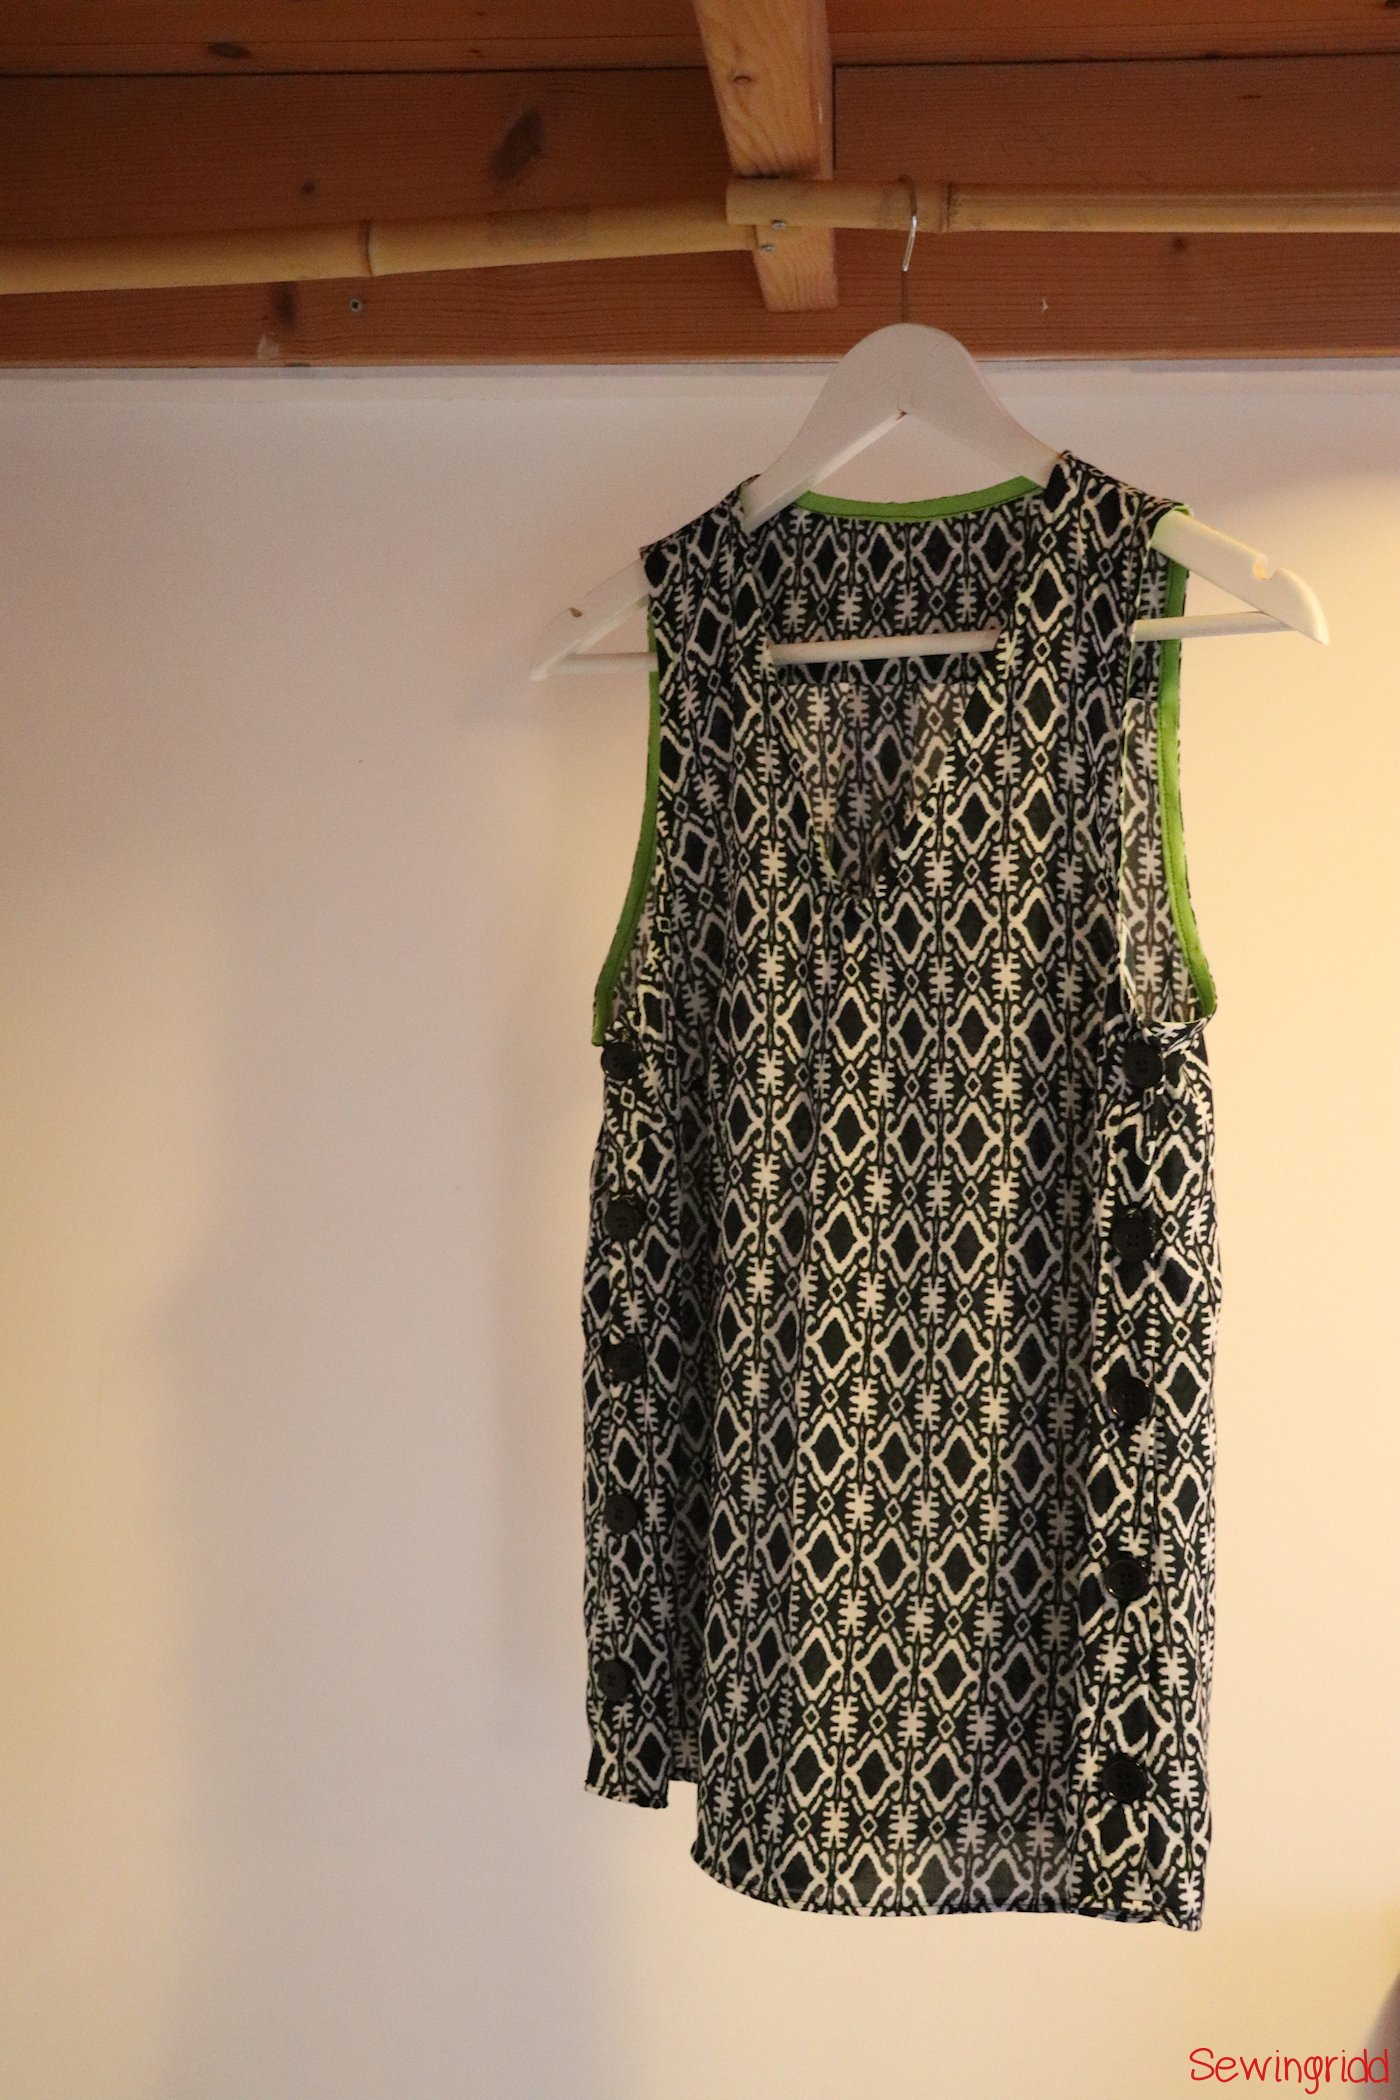 Freshly rereleased Tula dress pattern by Laela Jeyne Patterns, sewn by Sewingridd